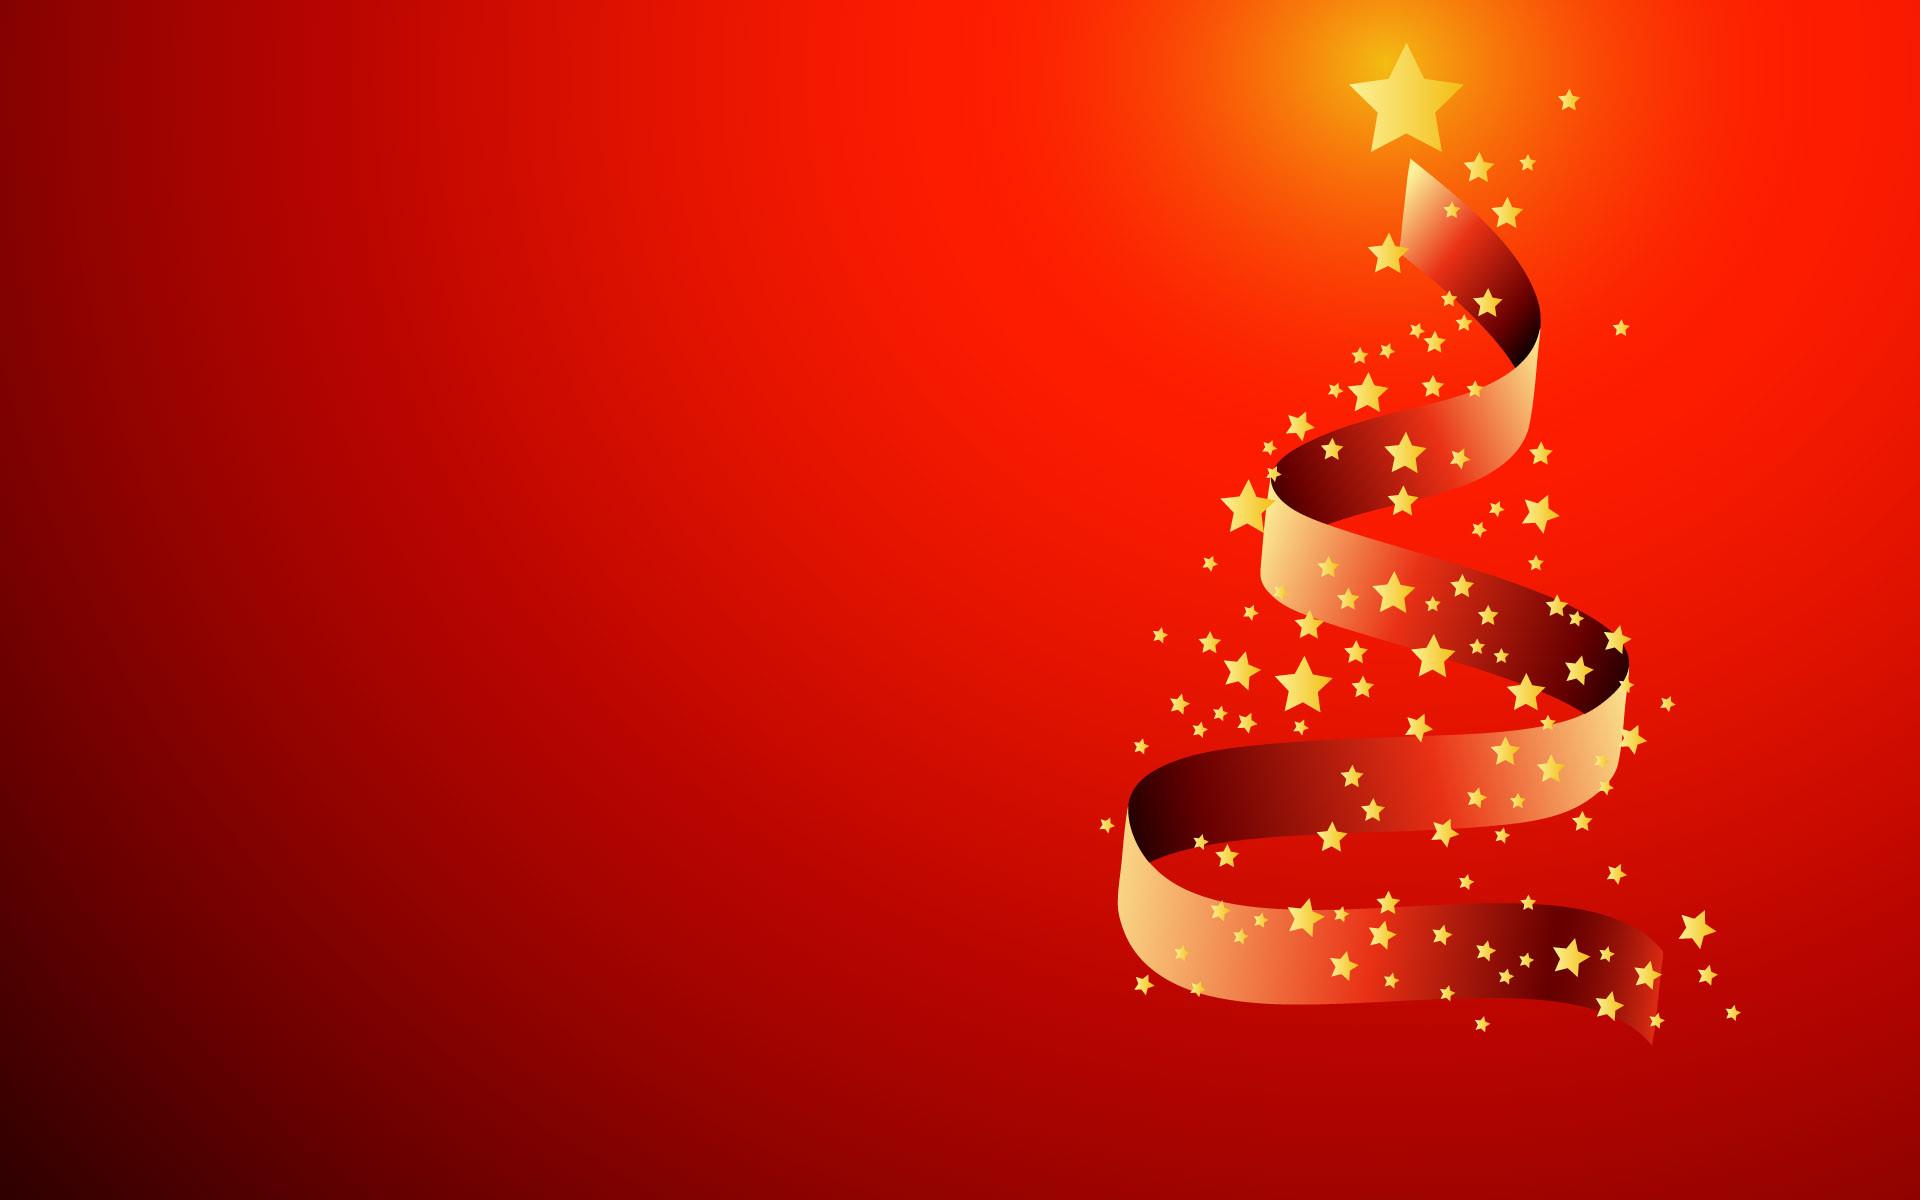 Sfondi natalizi hd 58 immagini for Sfondi natalizi 1920x1080